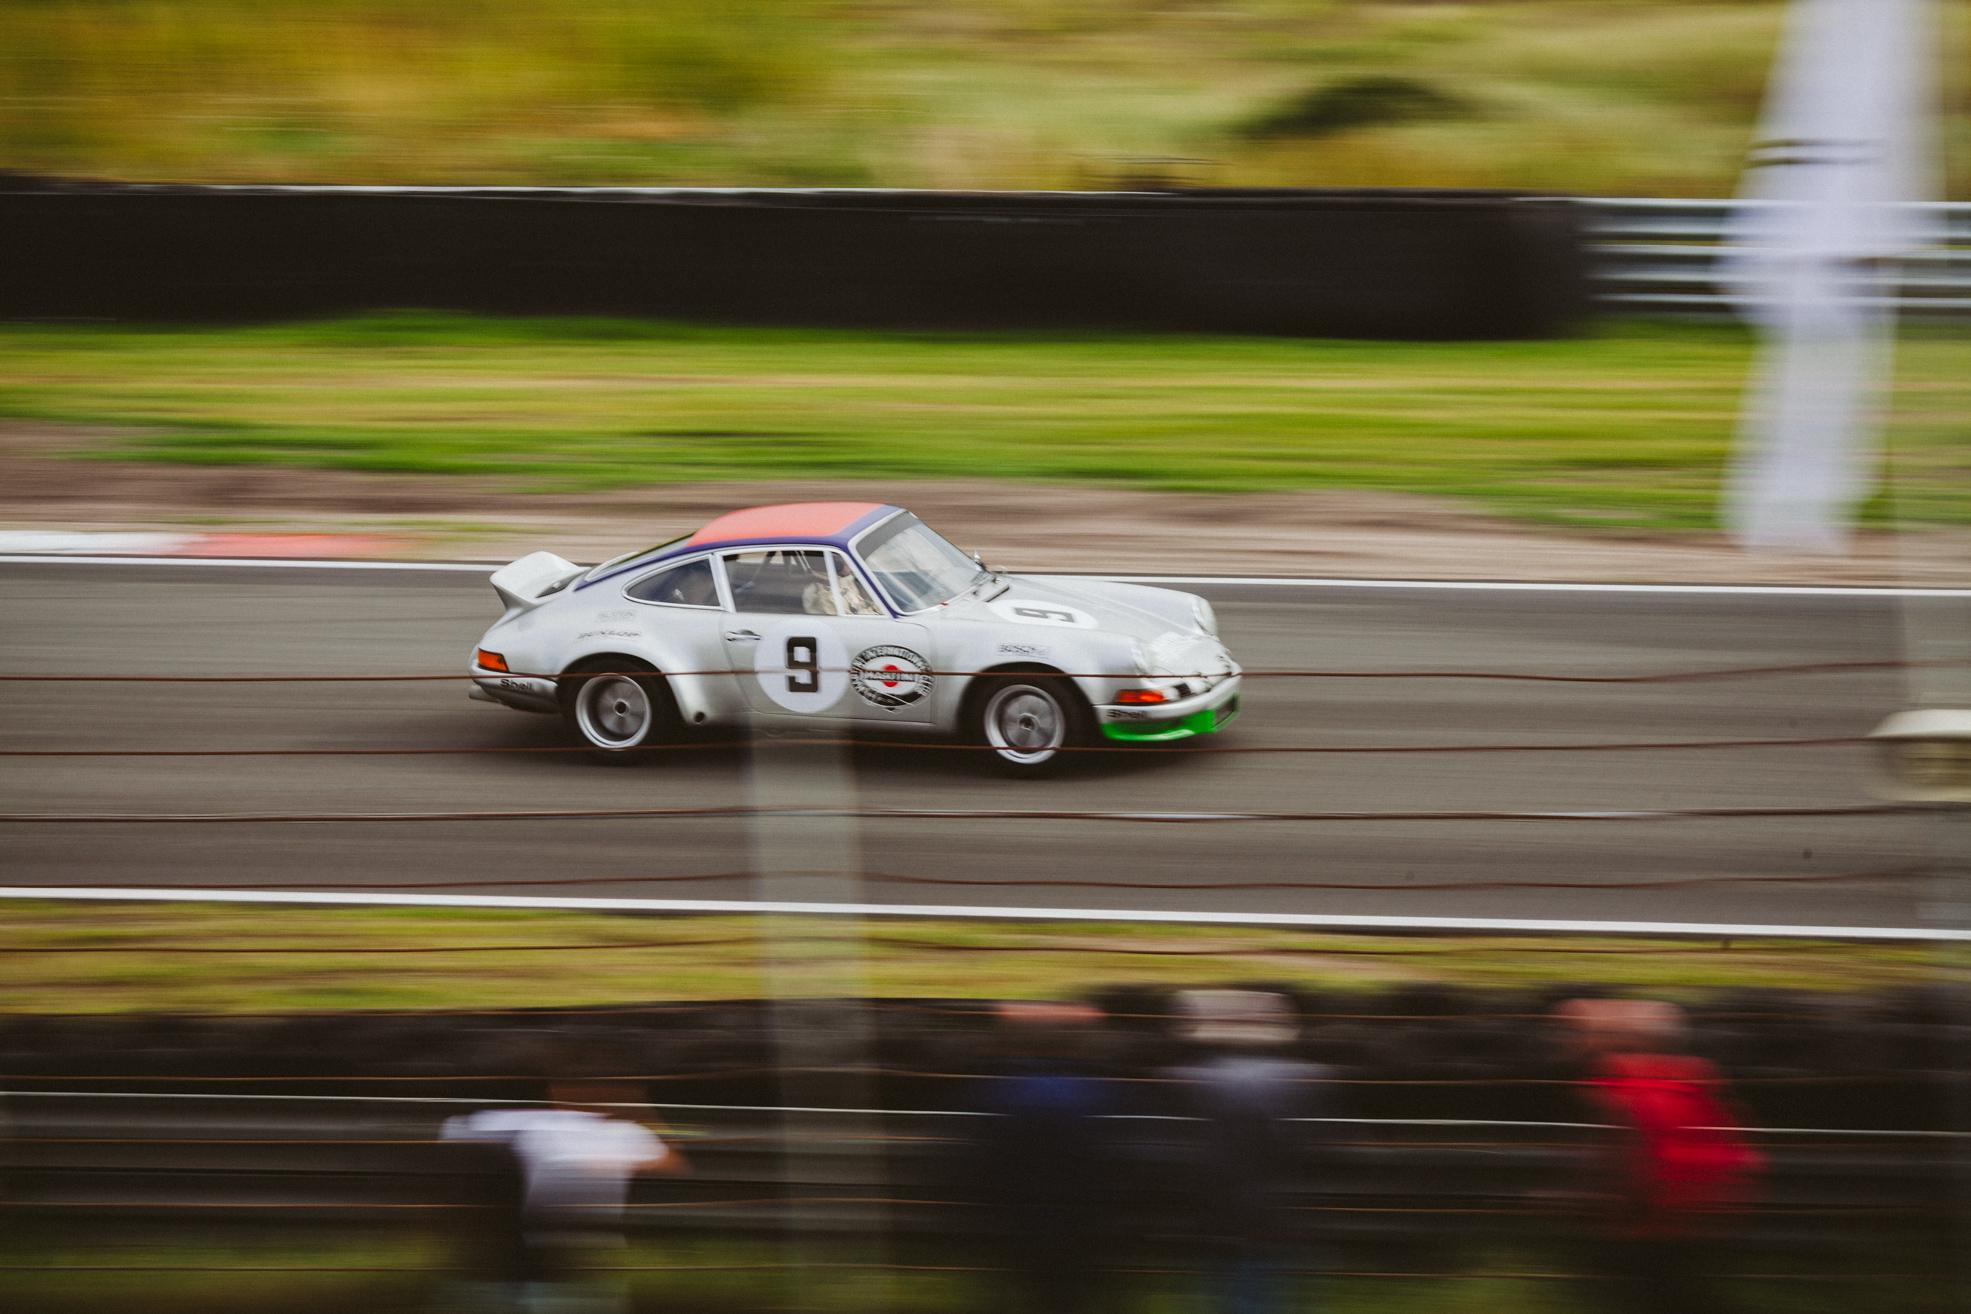 Porsche Grand Prix